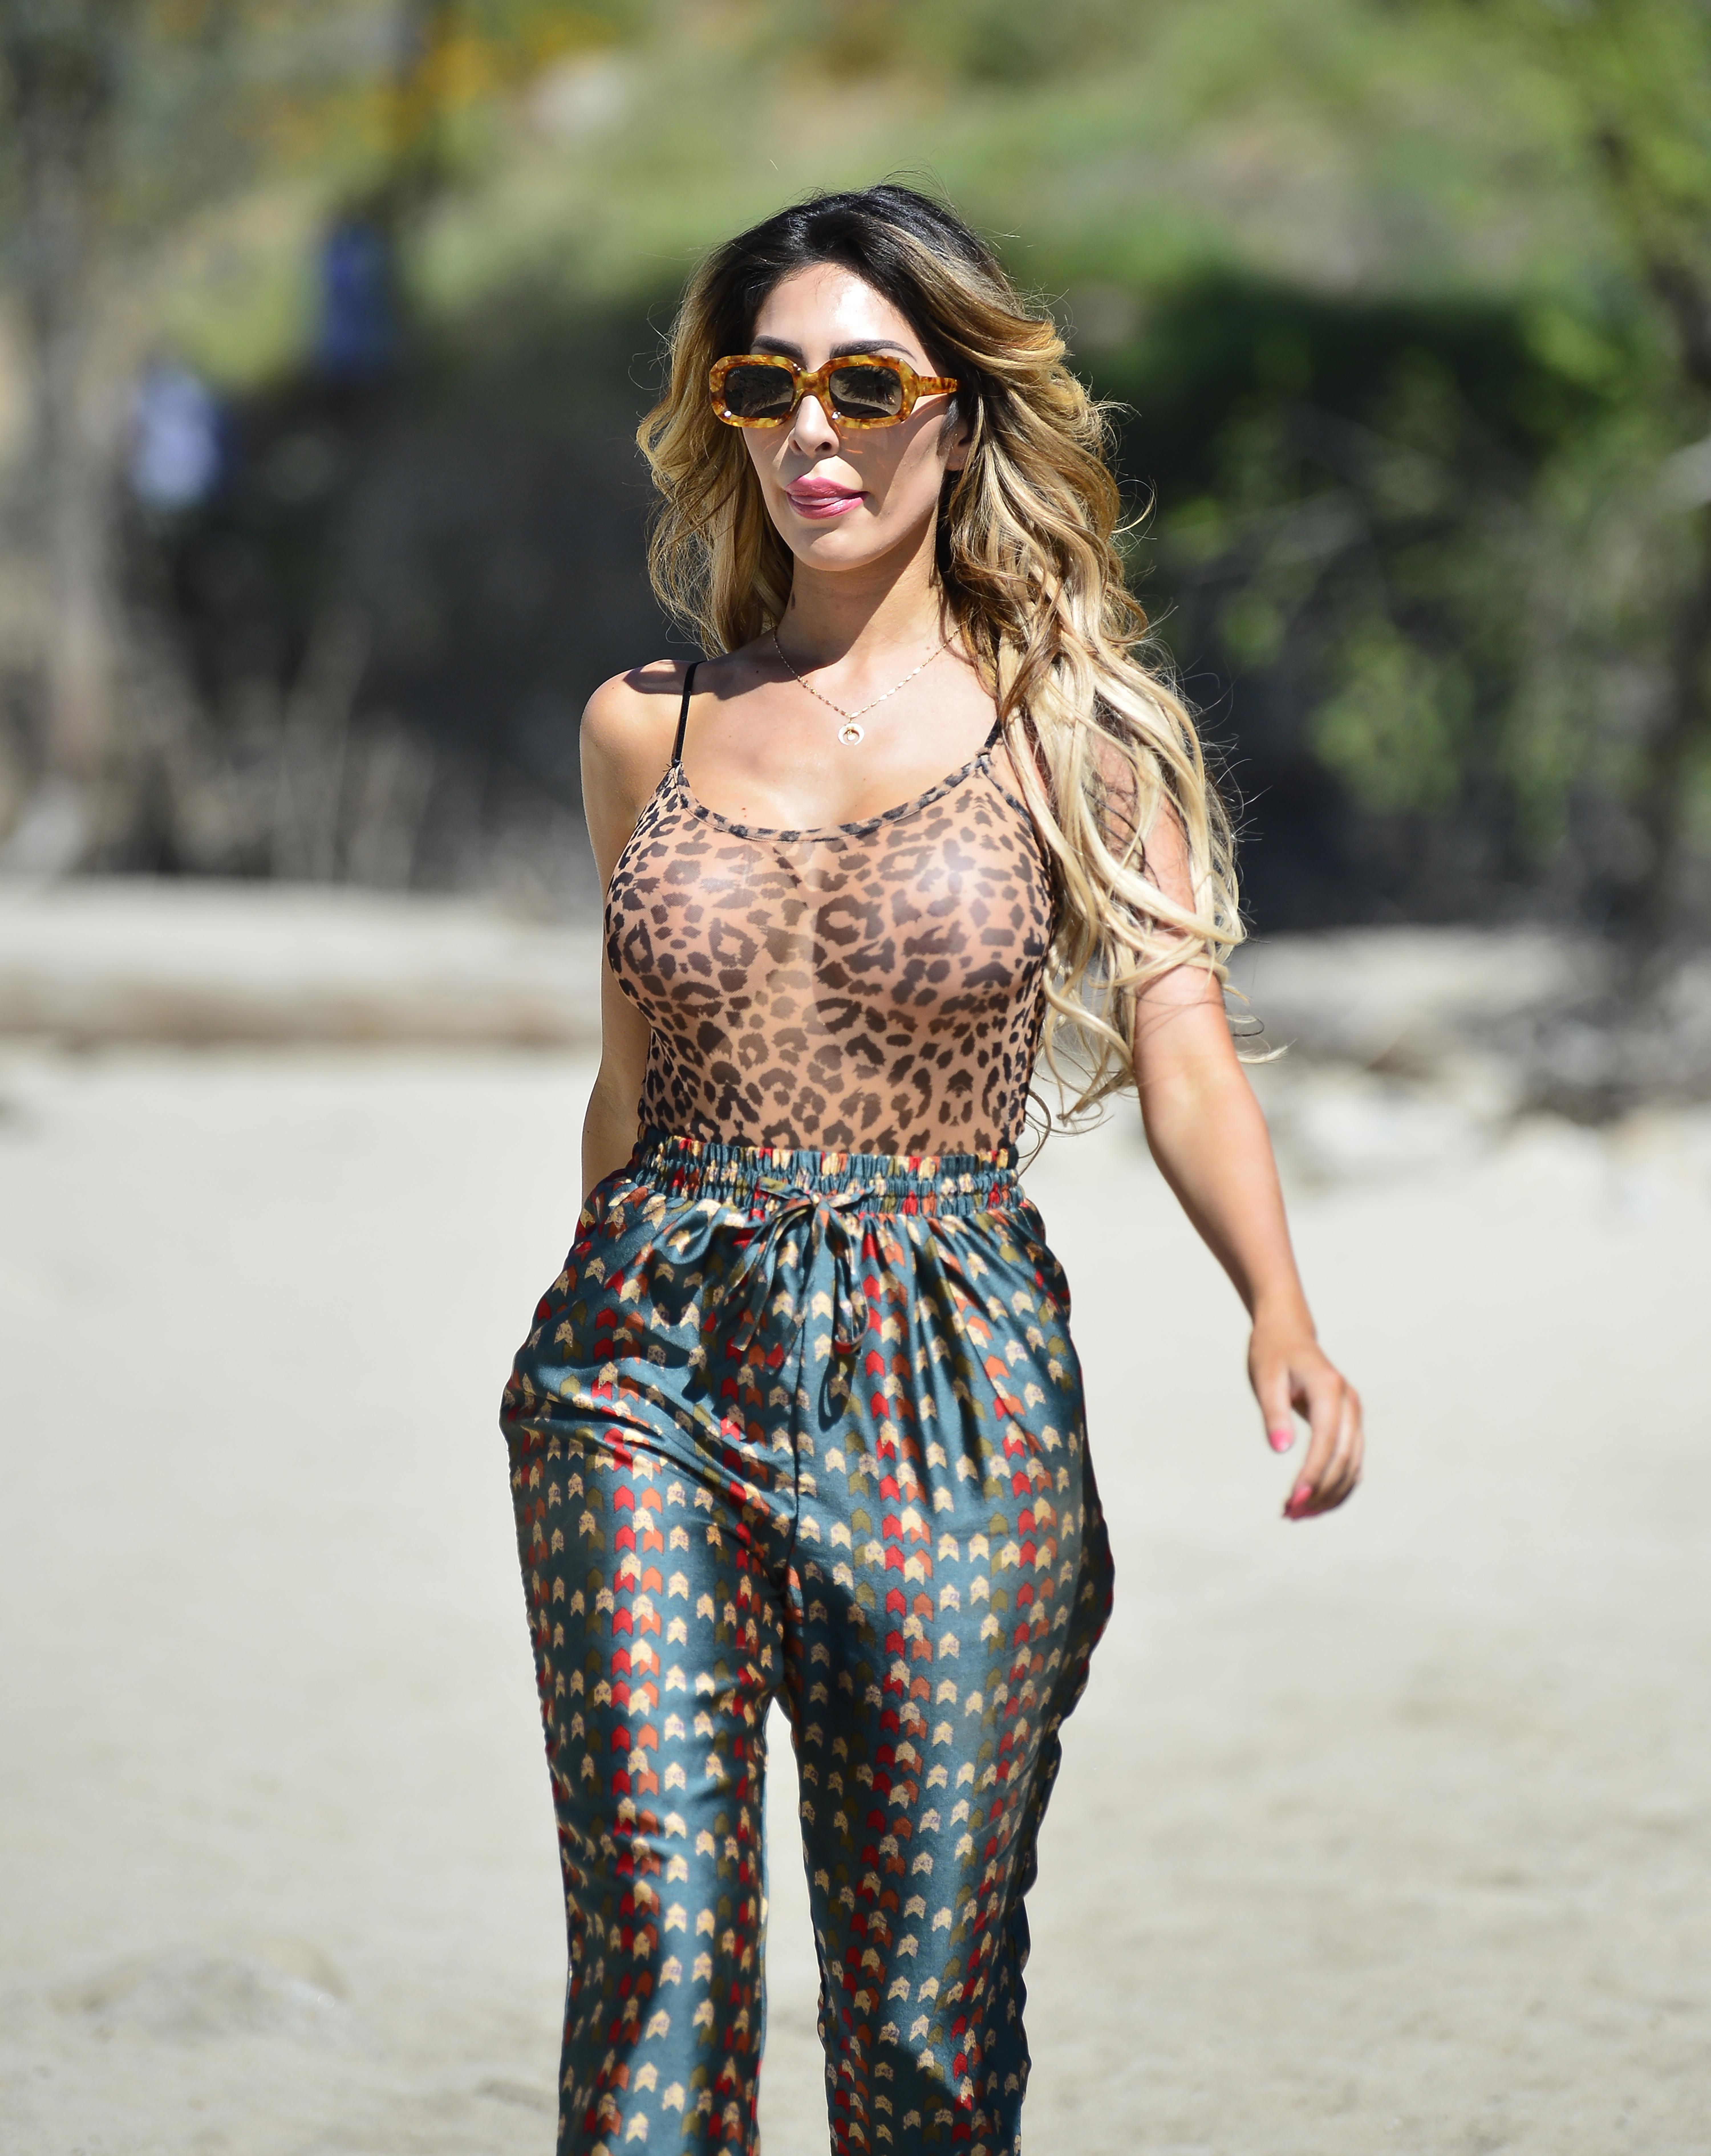 Leopard Abraham Print Sheer Beach Farrah Hits The In Swimsuit 34ALq5Rj